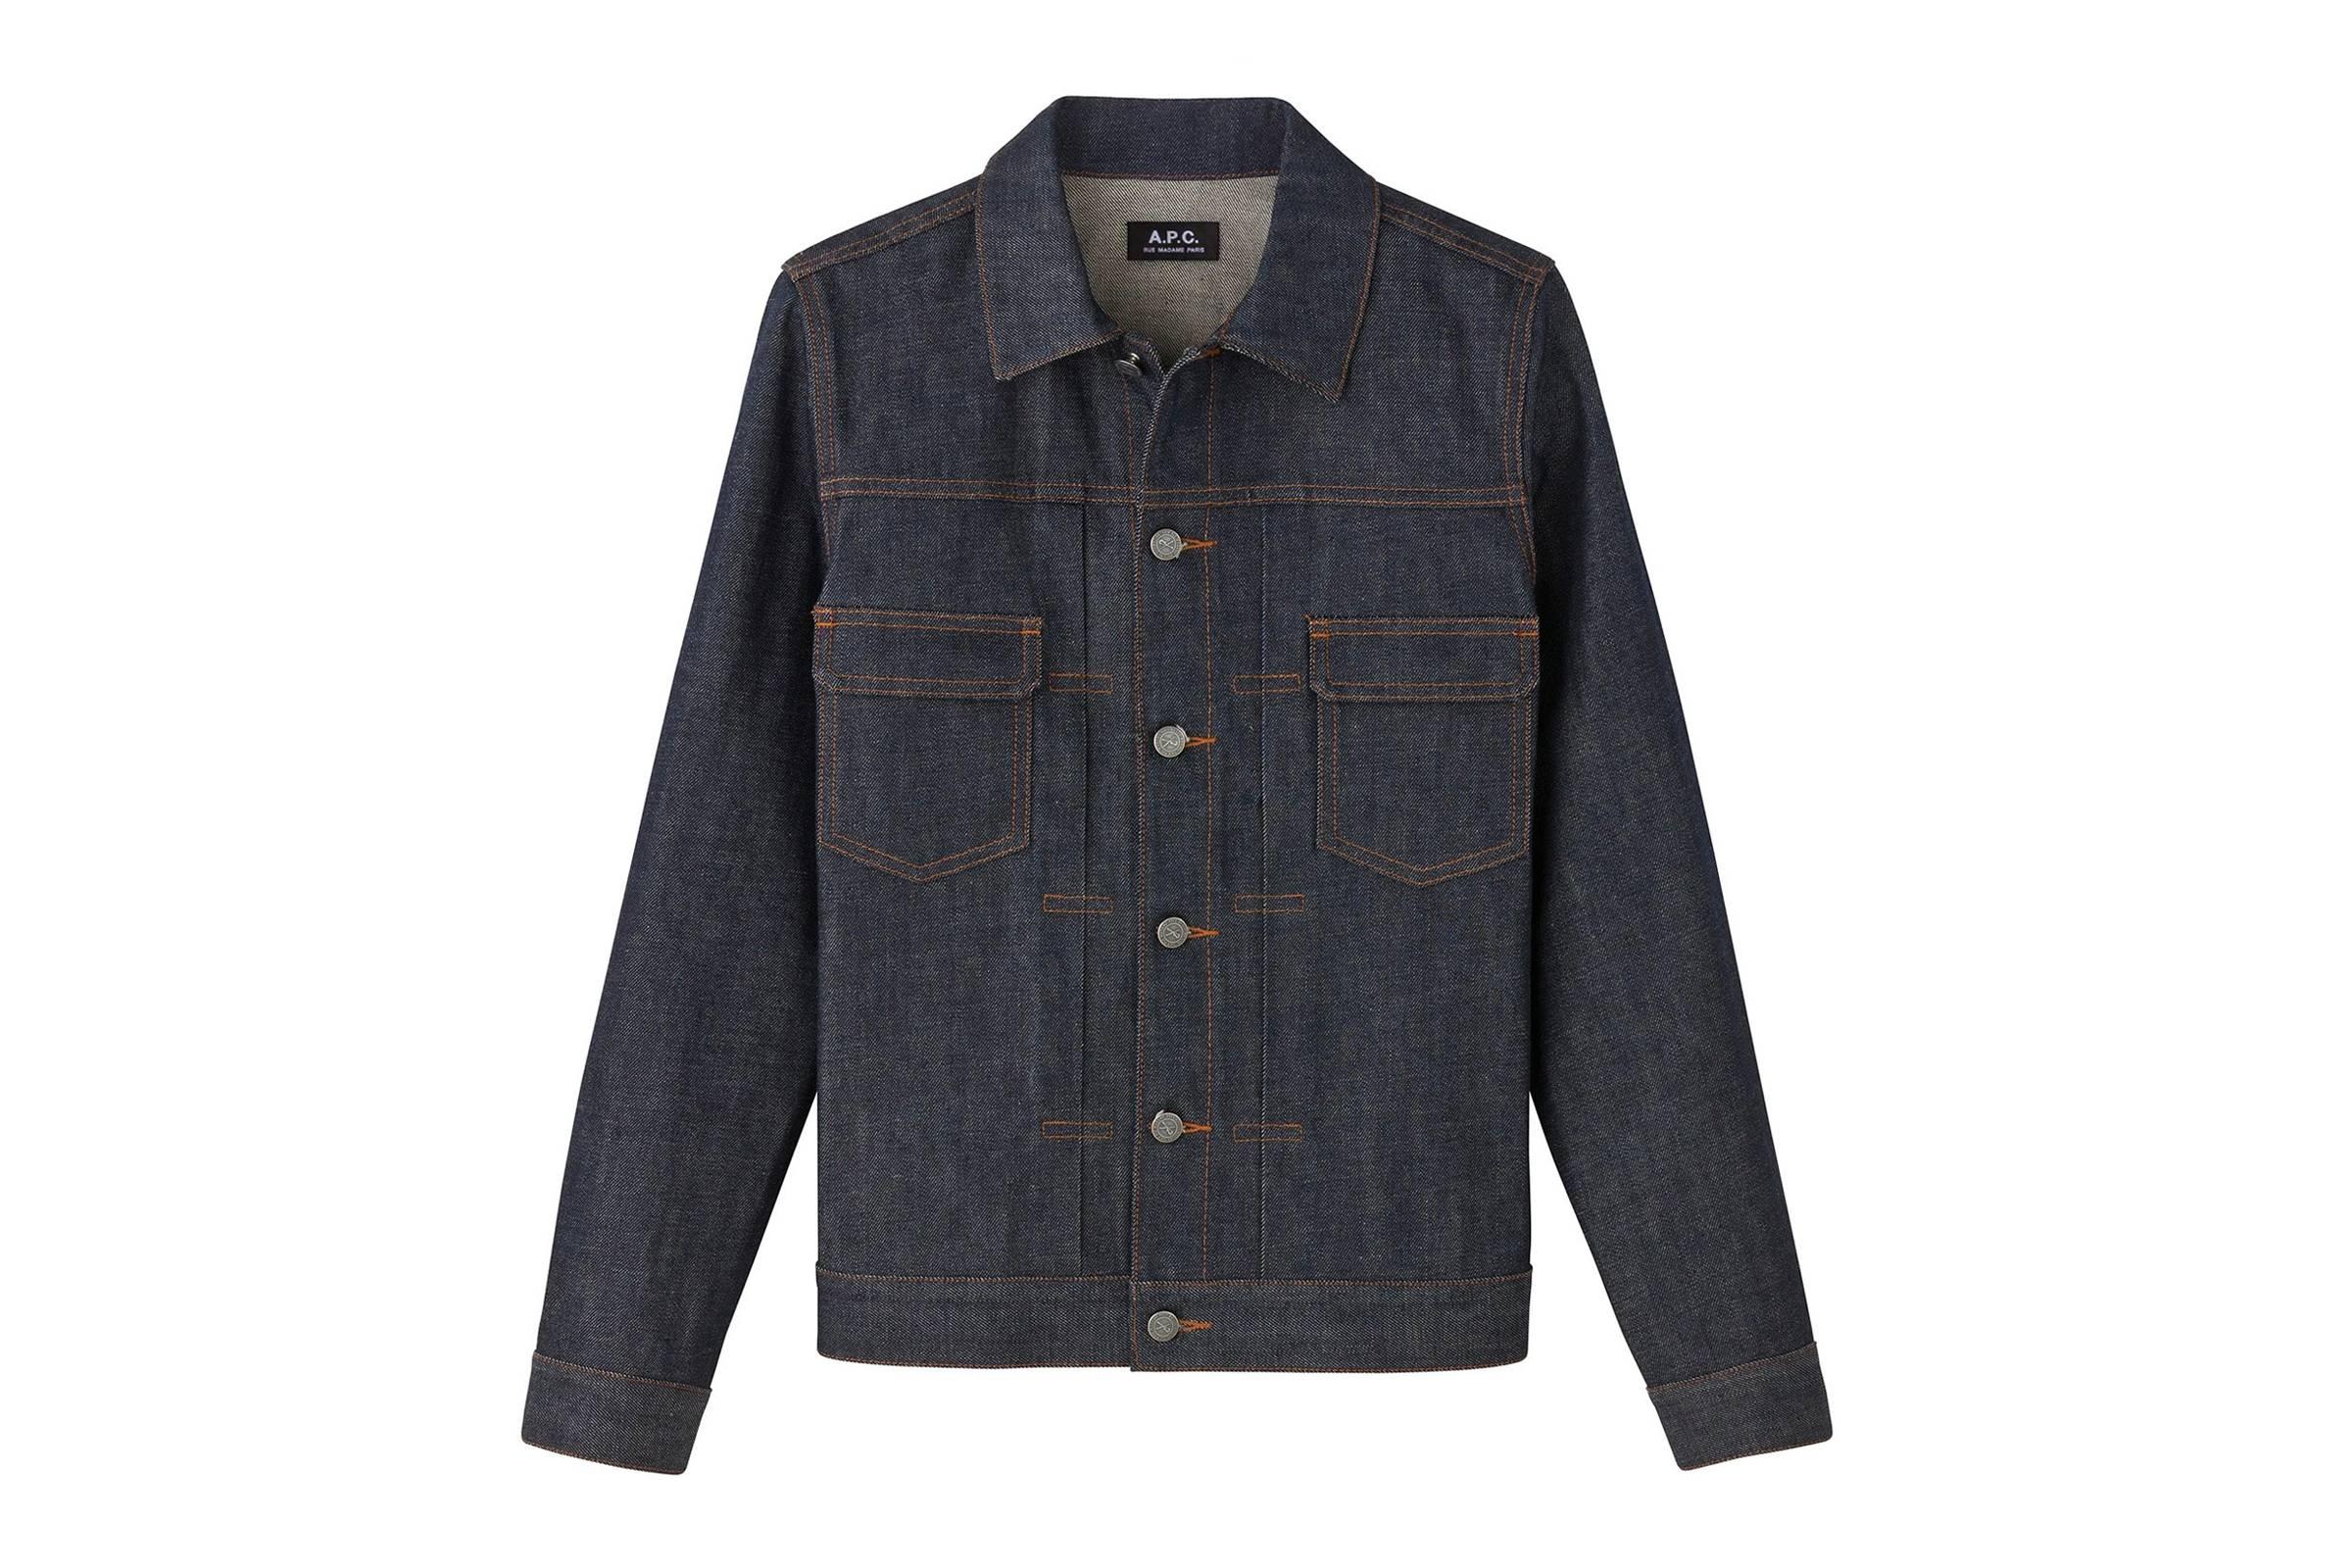 A.P.C. Veste Jean Work Jacket